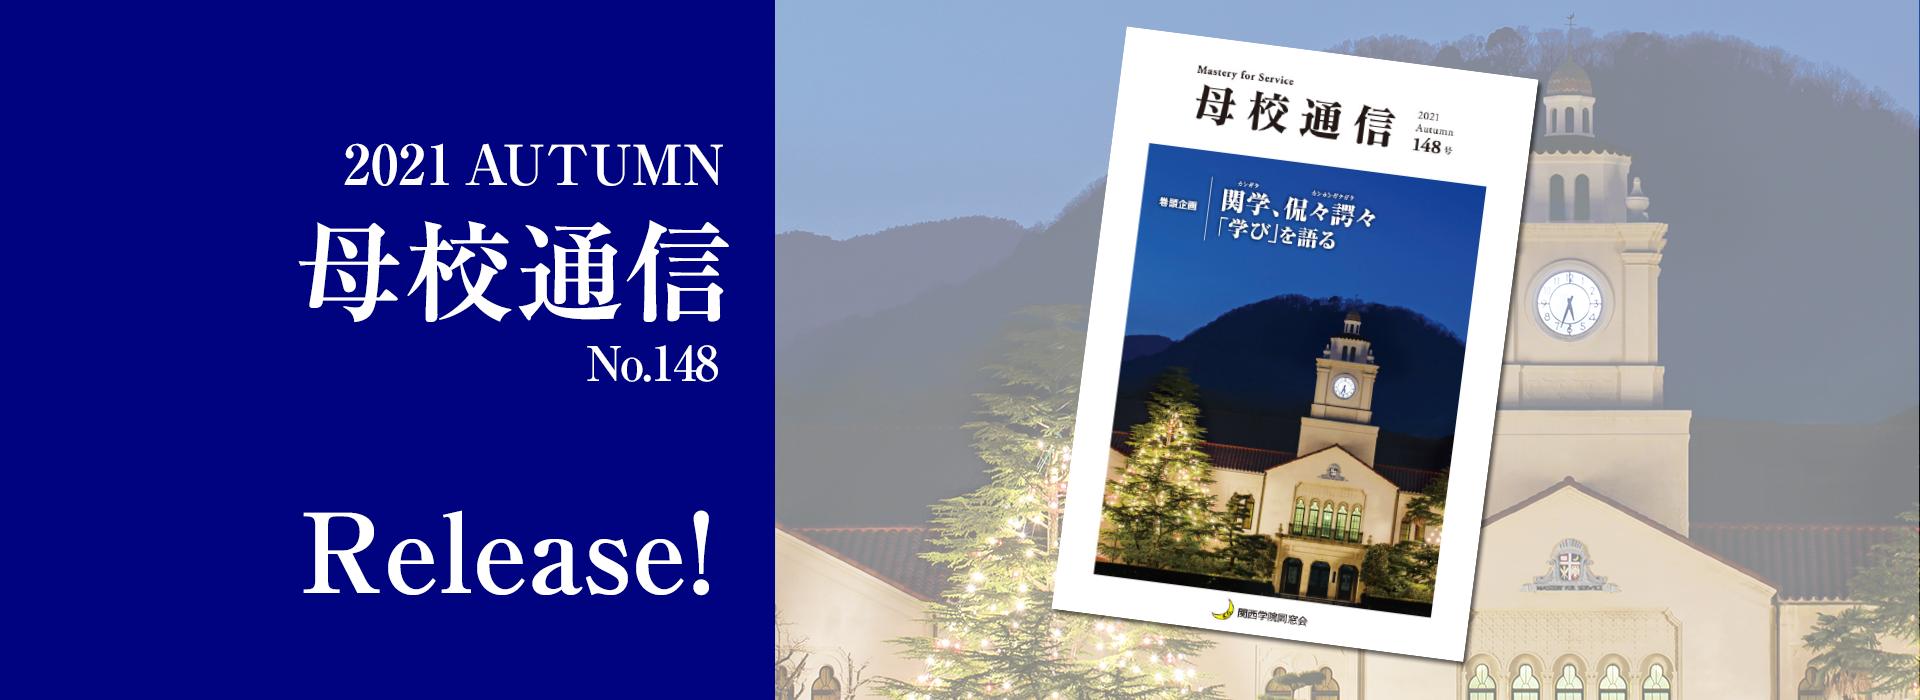 2021 Autumn 母校通信 No.148 Release!